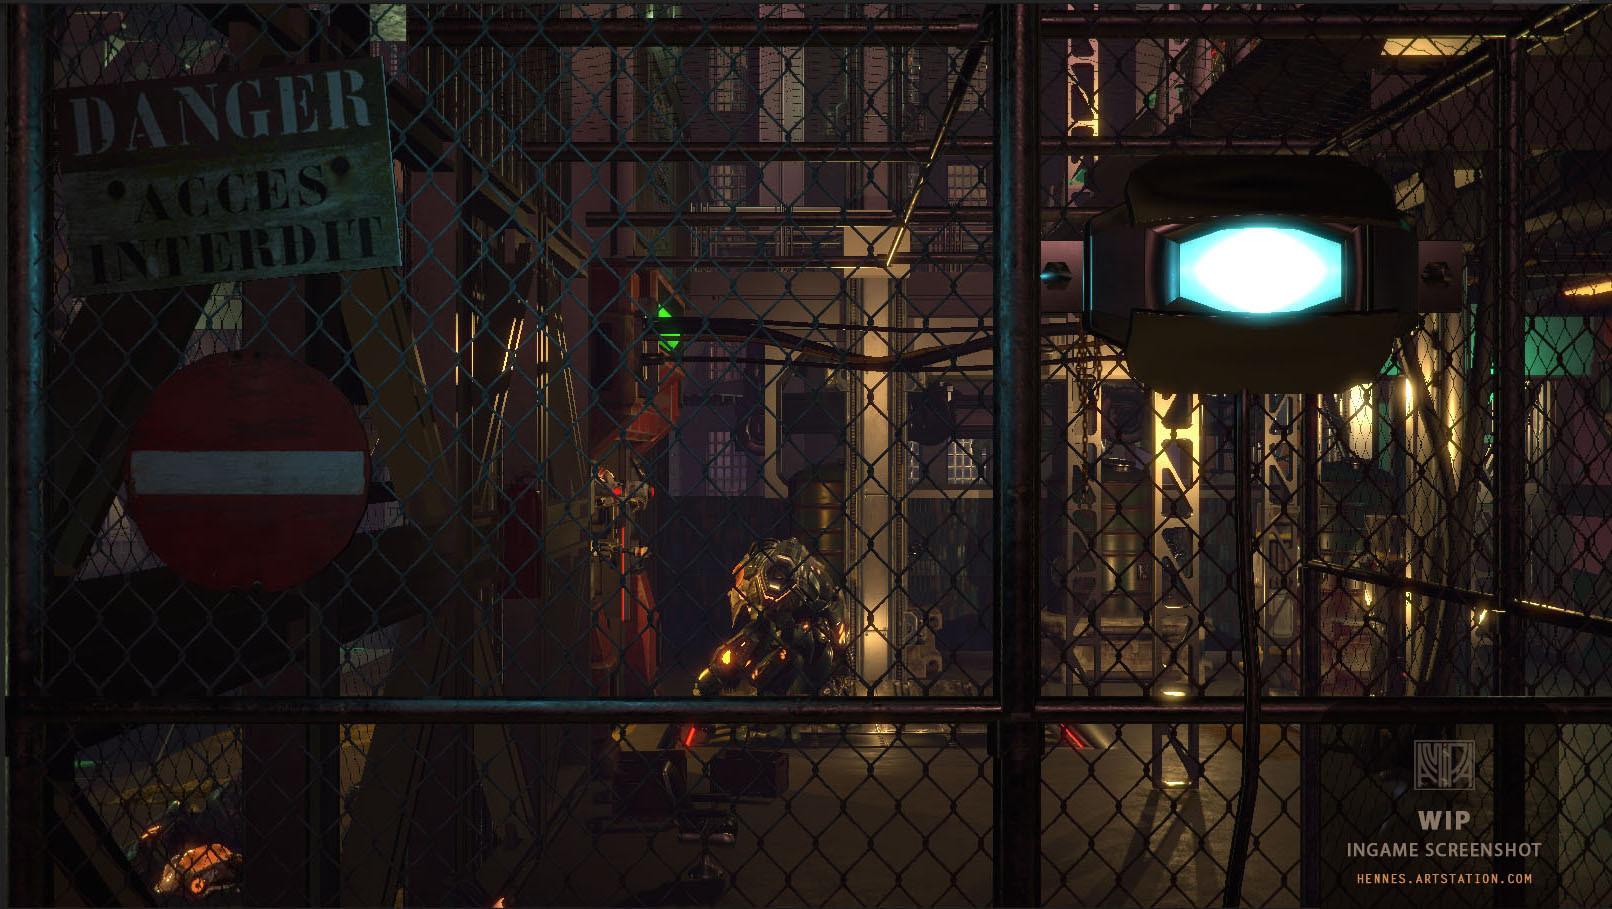 Amira hennes dystopy screenshot 03